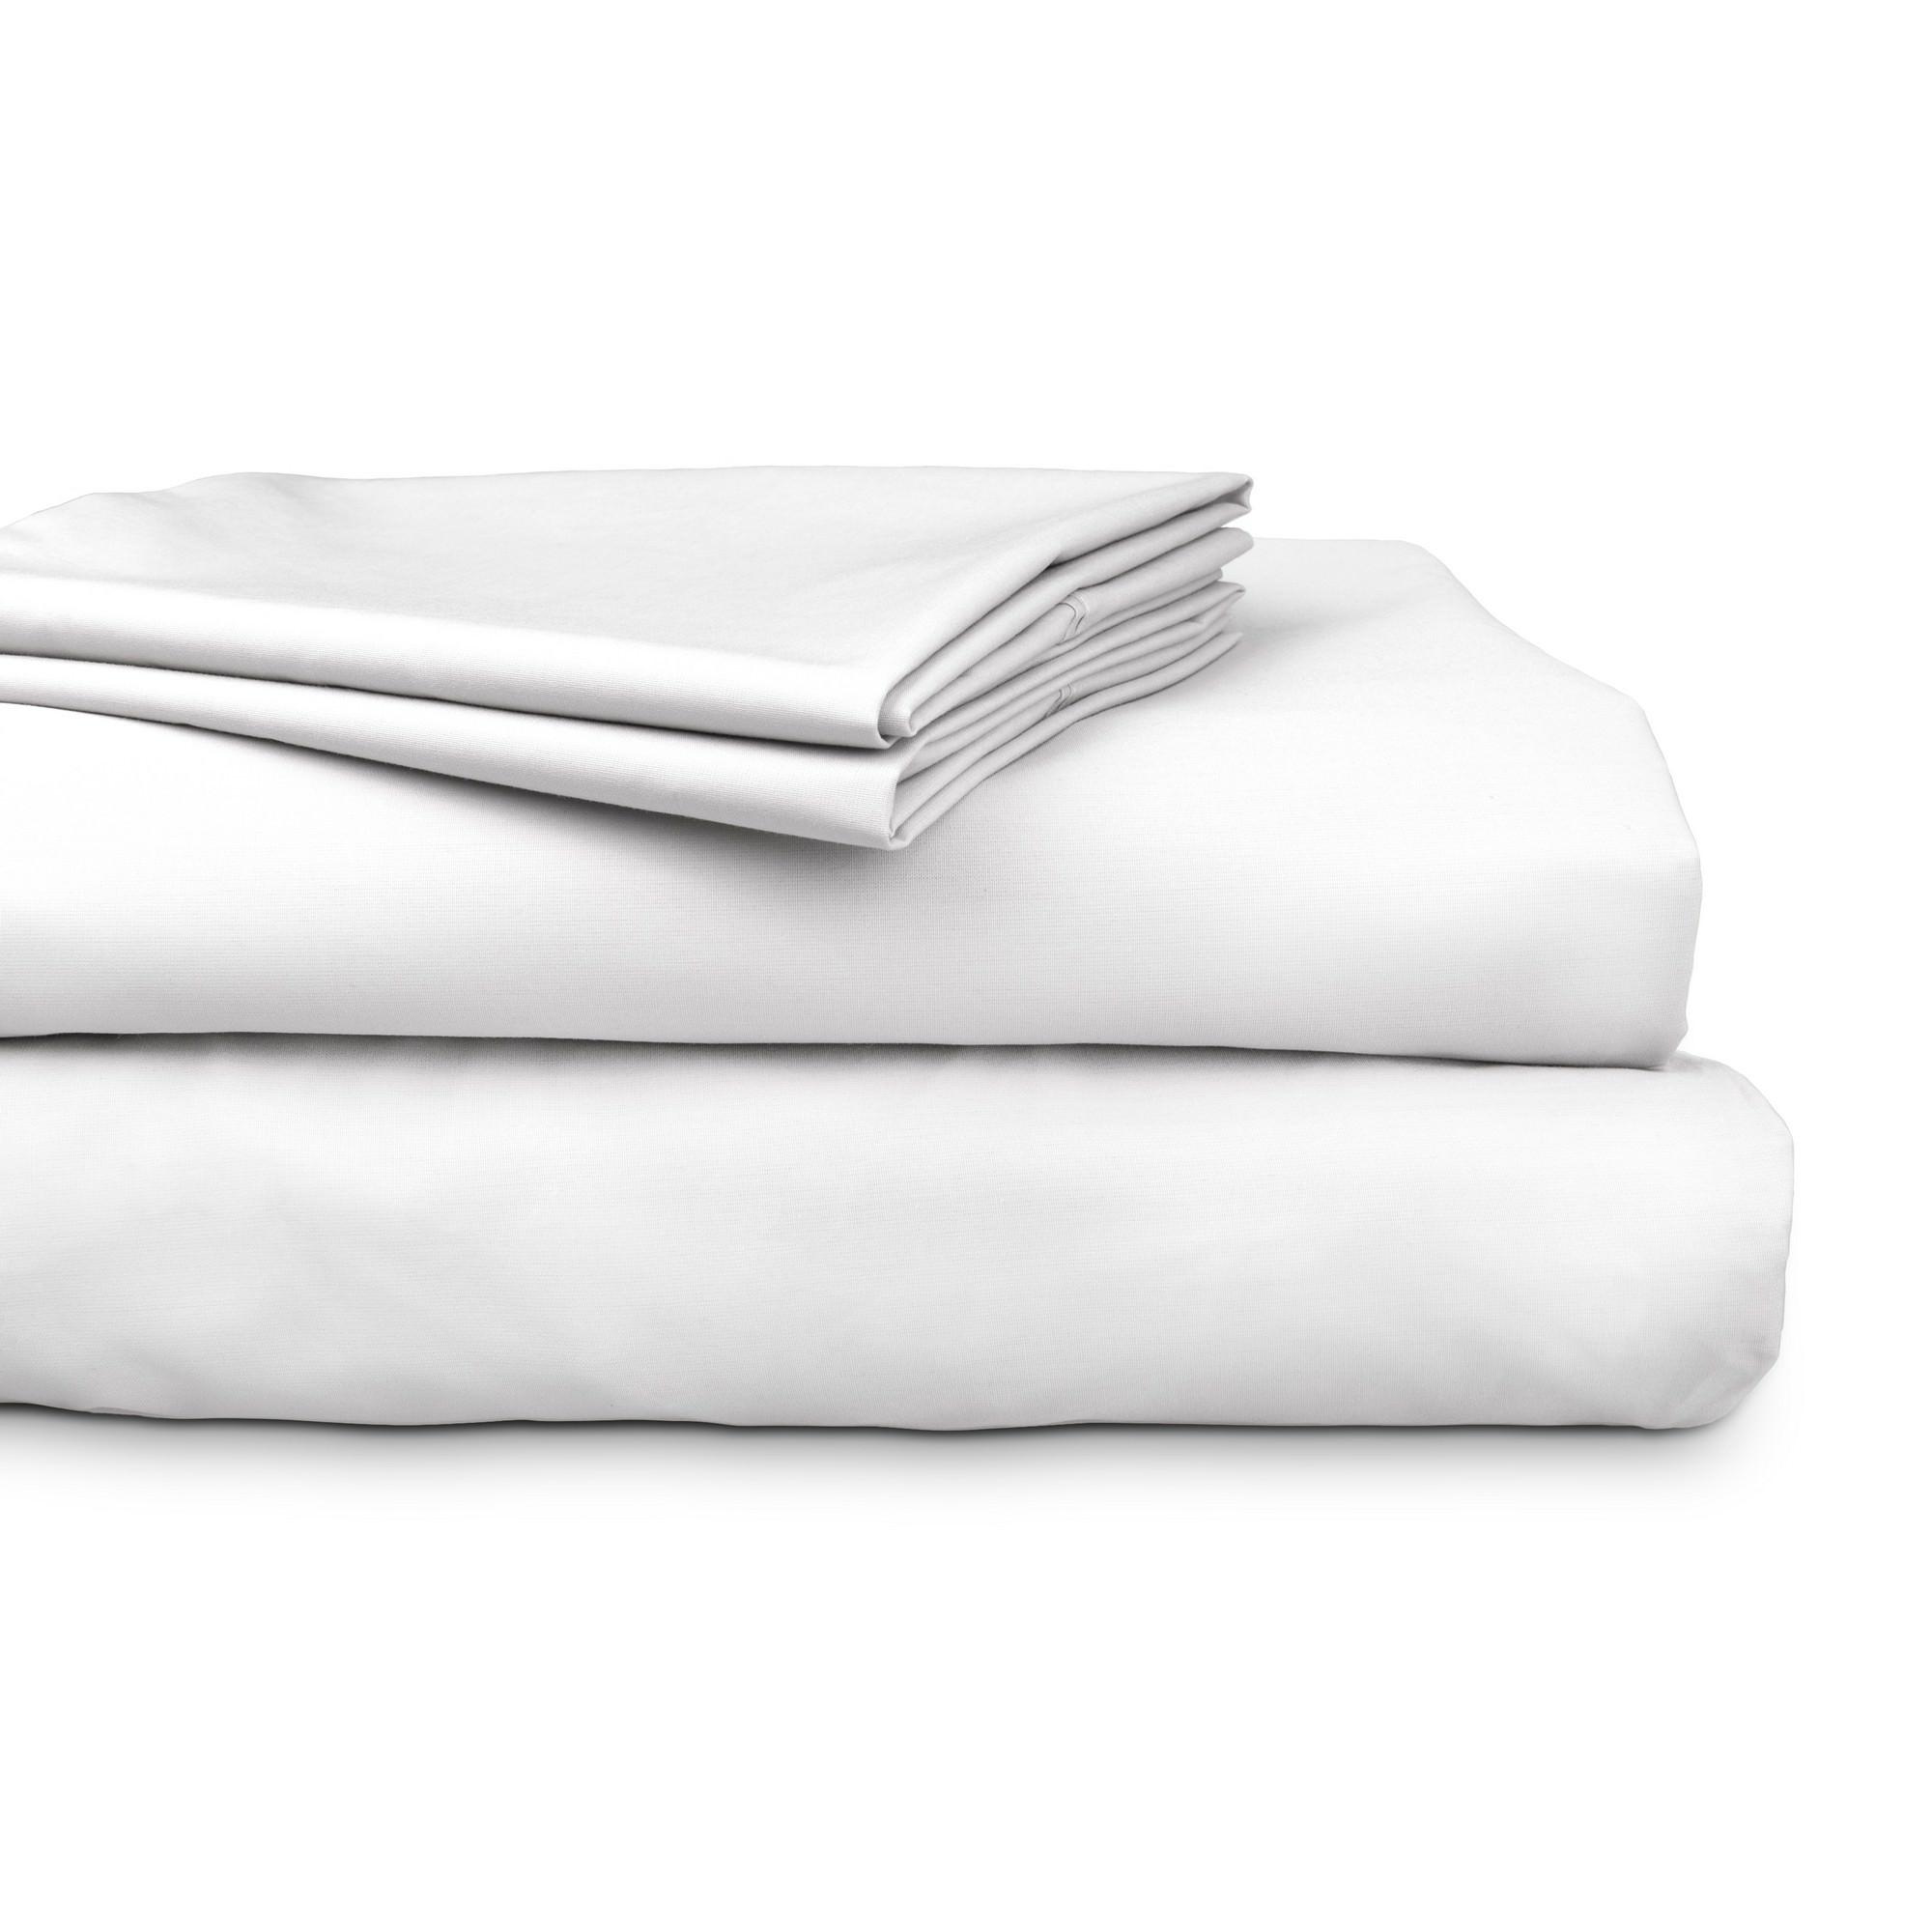 Ajee 4 Piece 300TC Cotton Sheet Set,Mega King, White